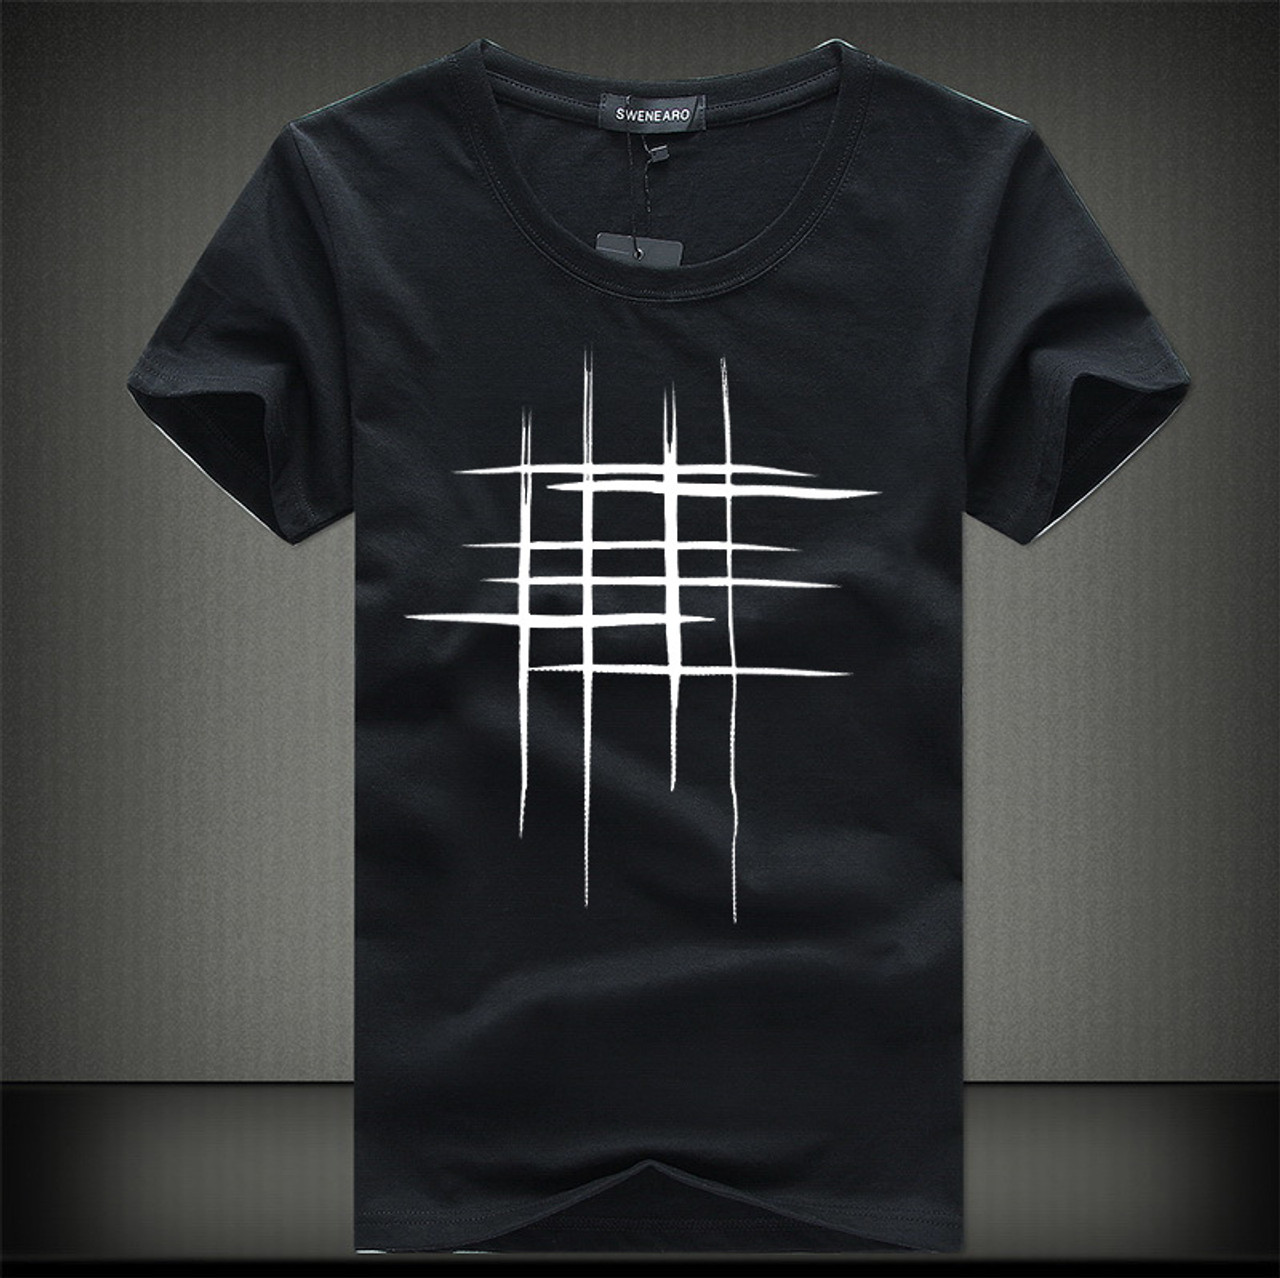 48bb249ae ... SWENEARO 2018 Simple creative design line cross Print cotton T Shirts  Men's New Arrival Summer Style ...